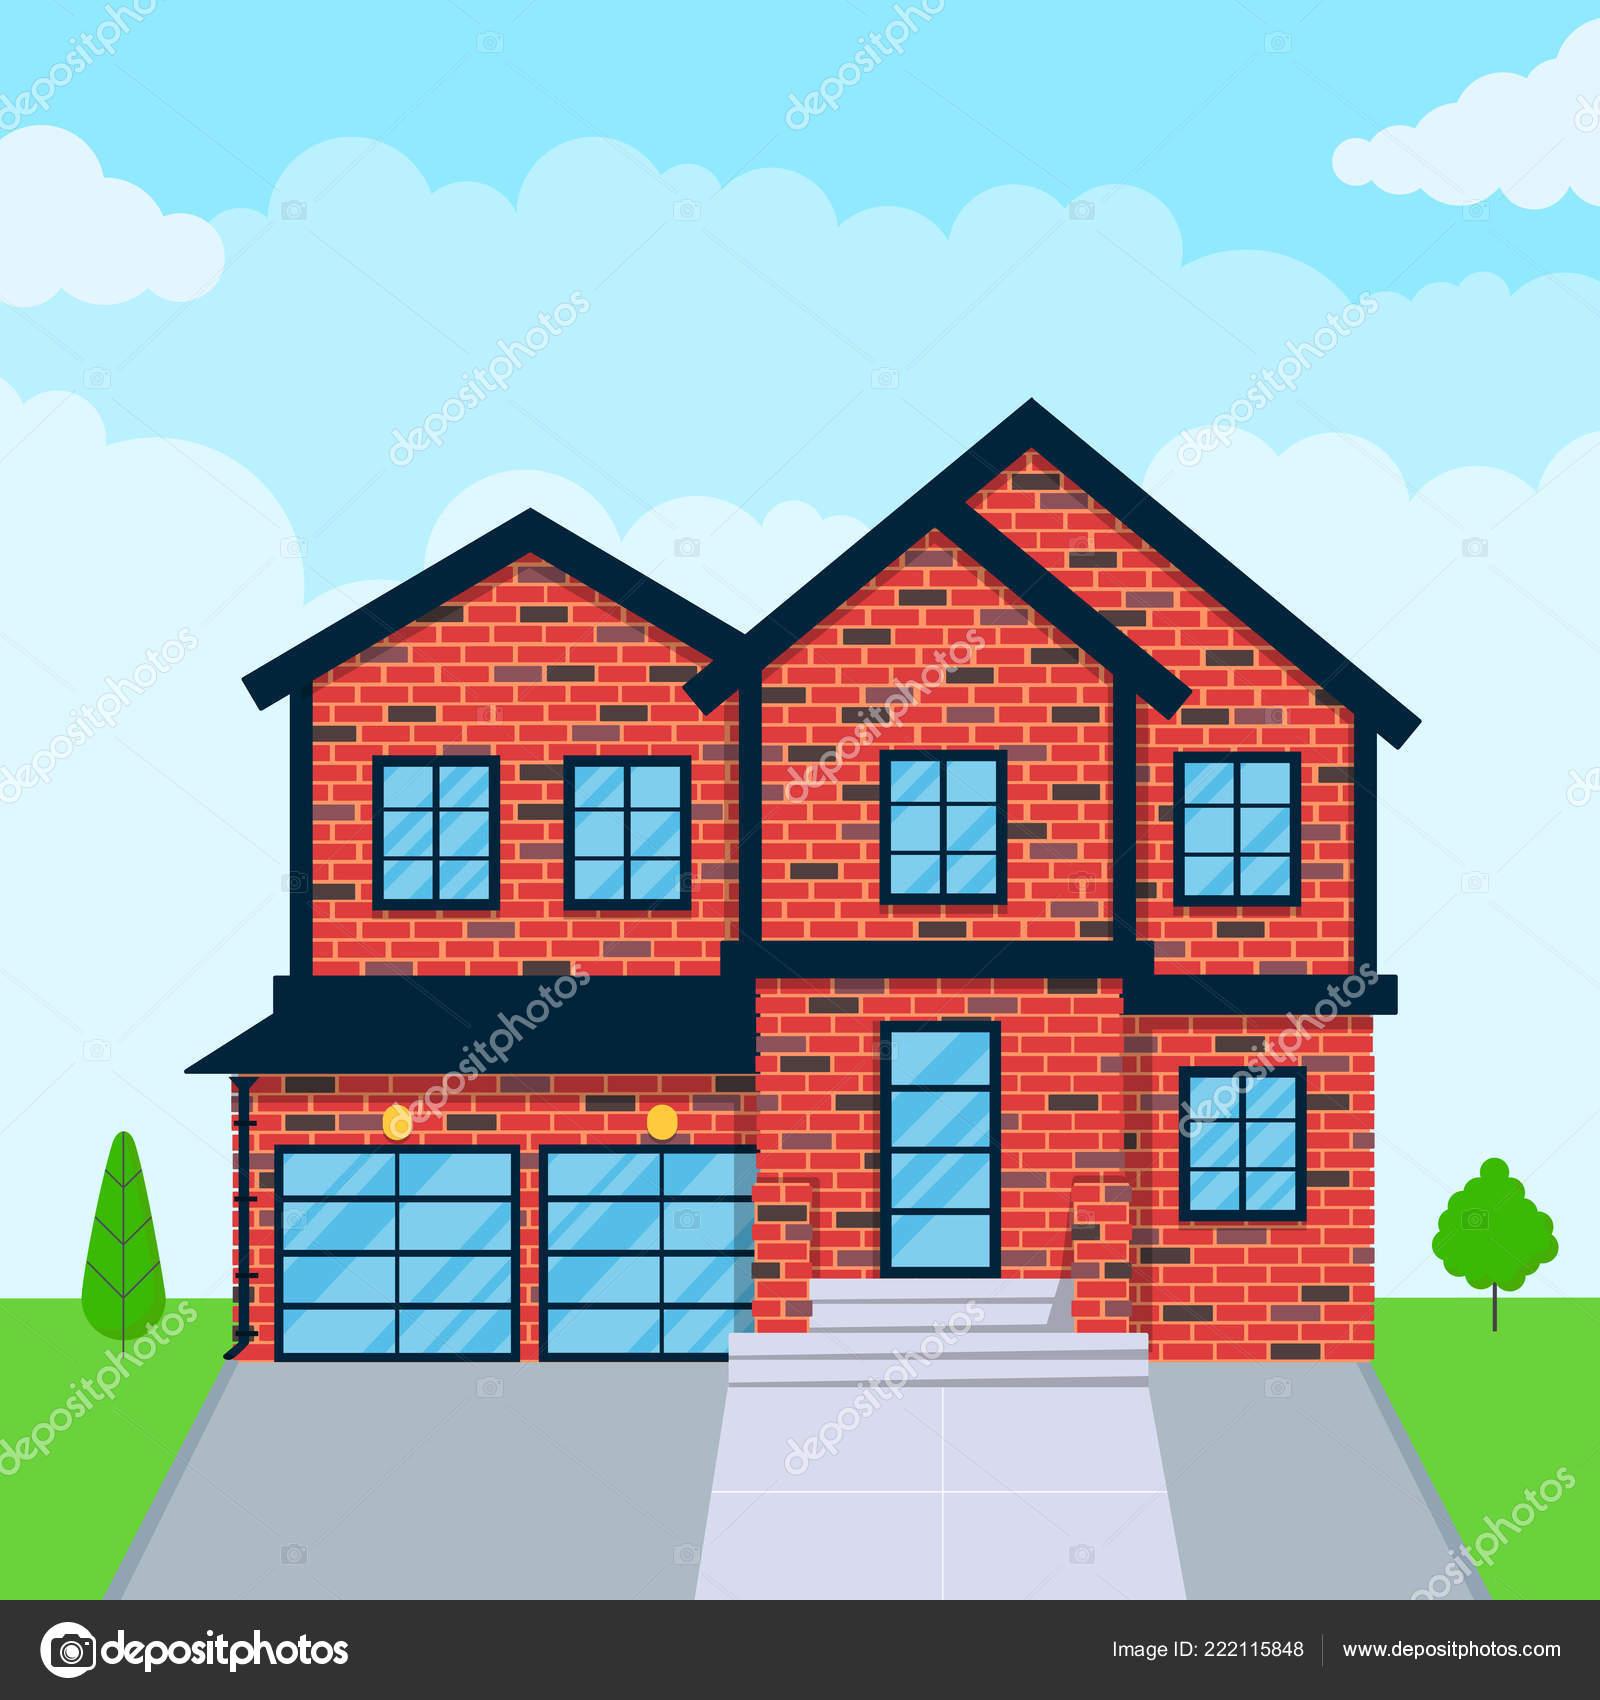 Brick House Exterior Flat Style Design Vector Illustration Roof Windows Stock Vector C Mironovkonstantin 222115848